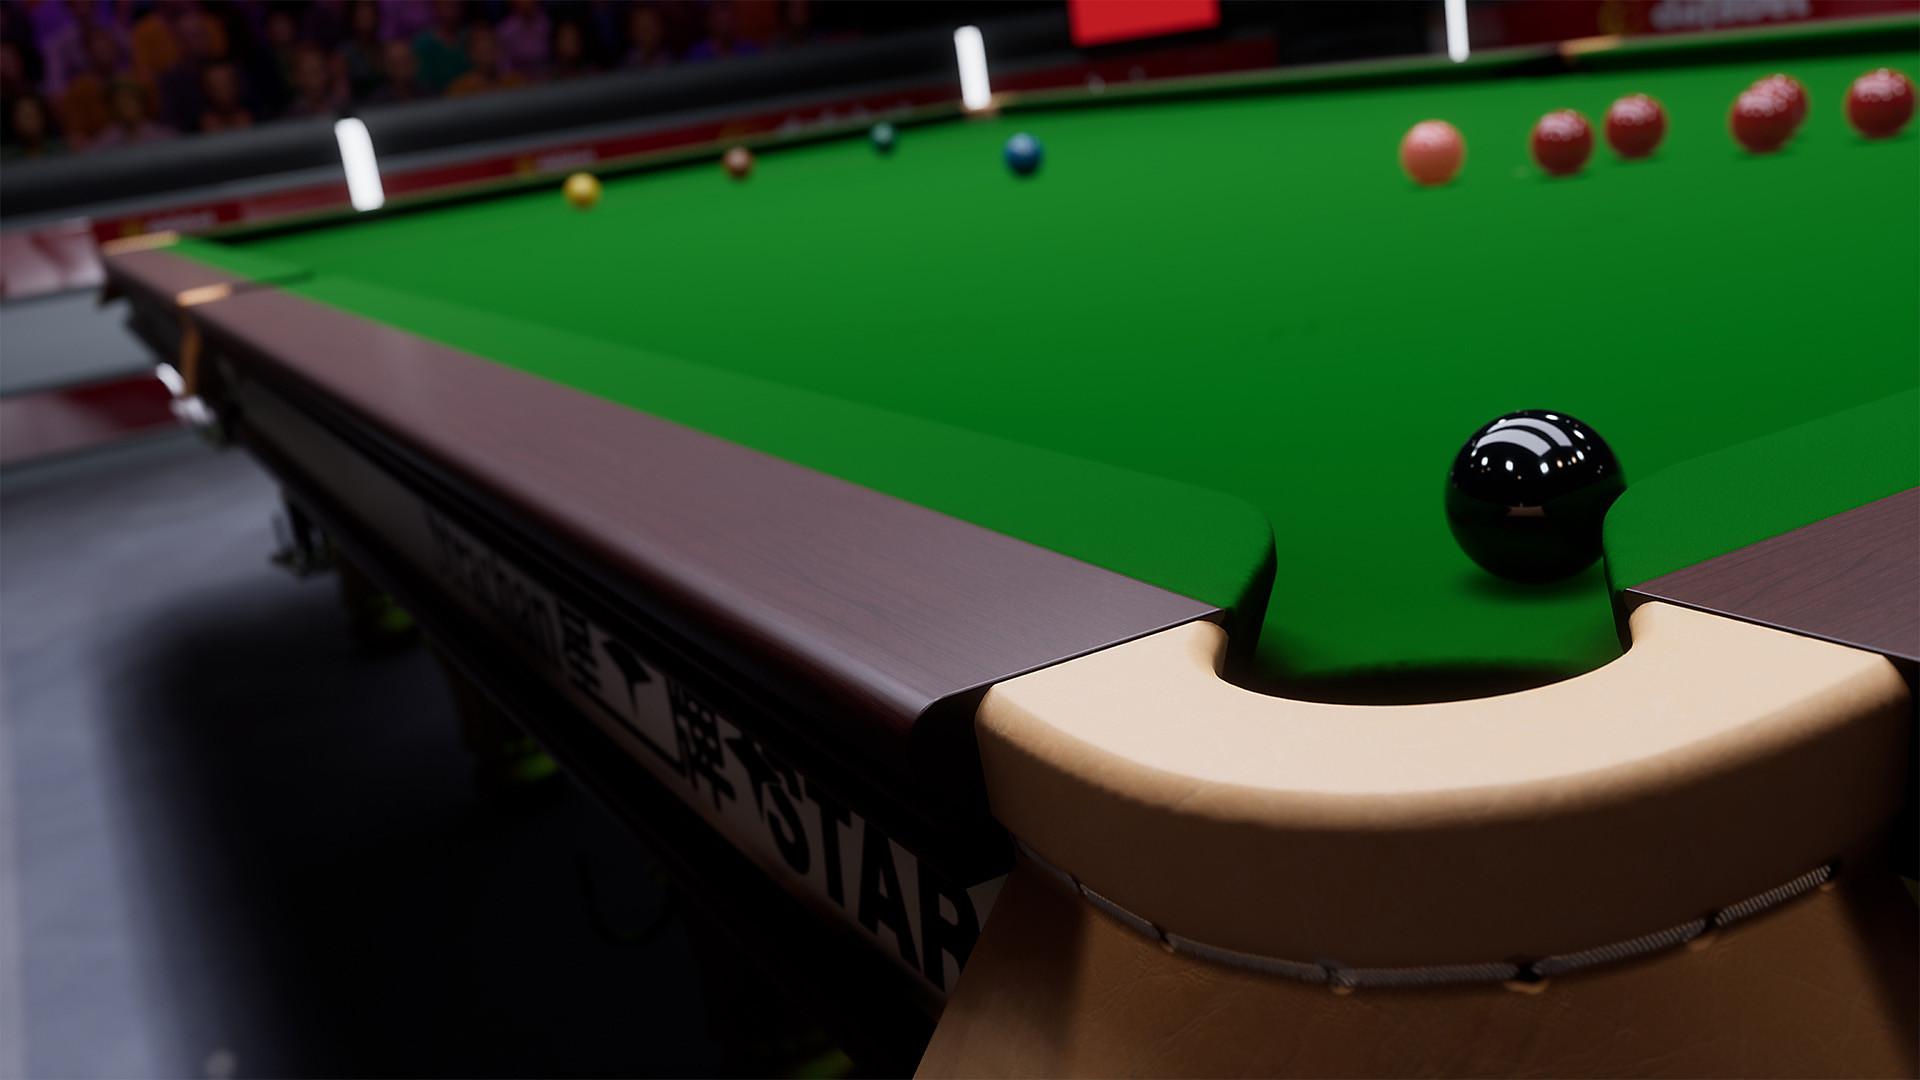 snooker-19-screenshot-04-ps4-us-16apr2019